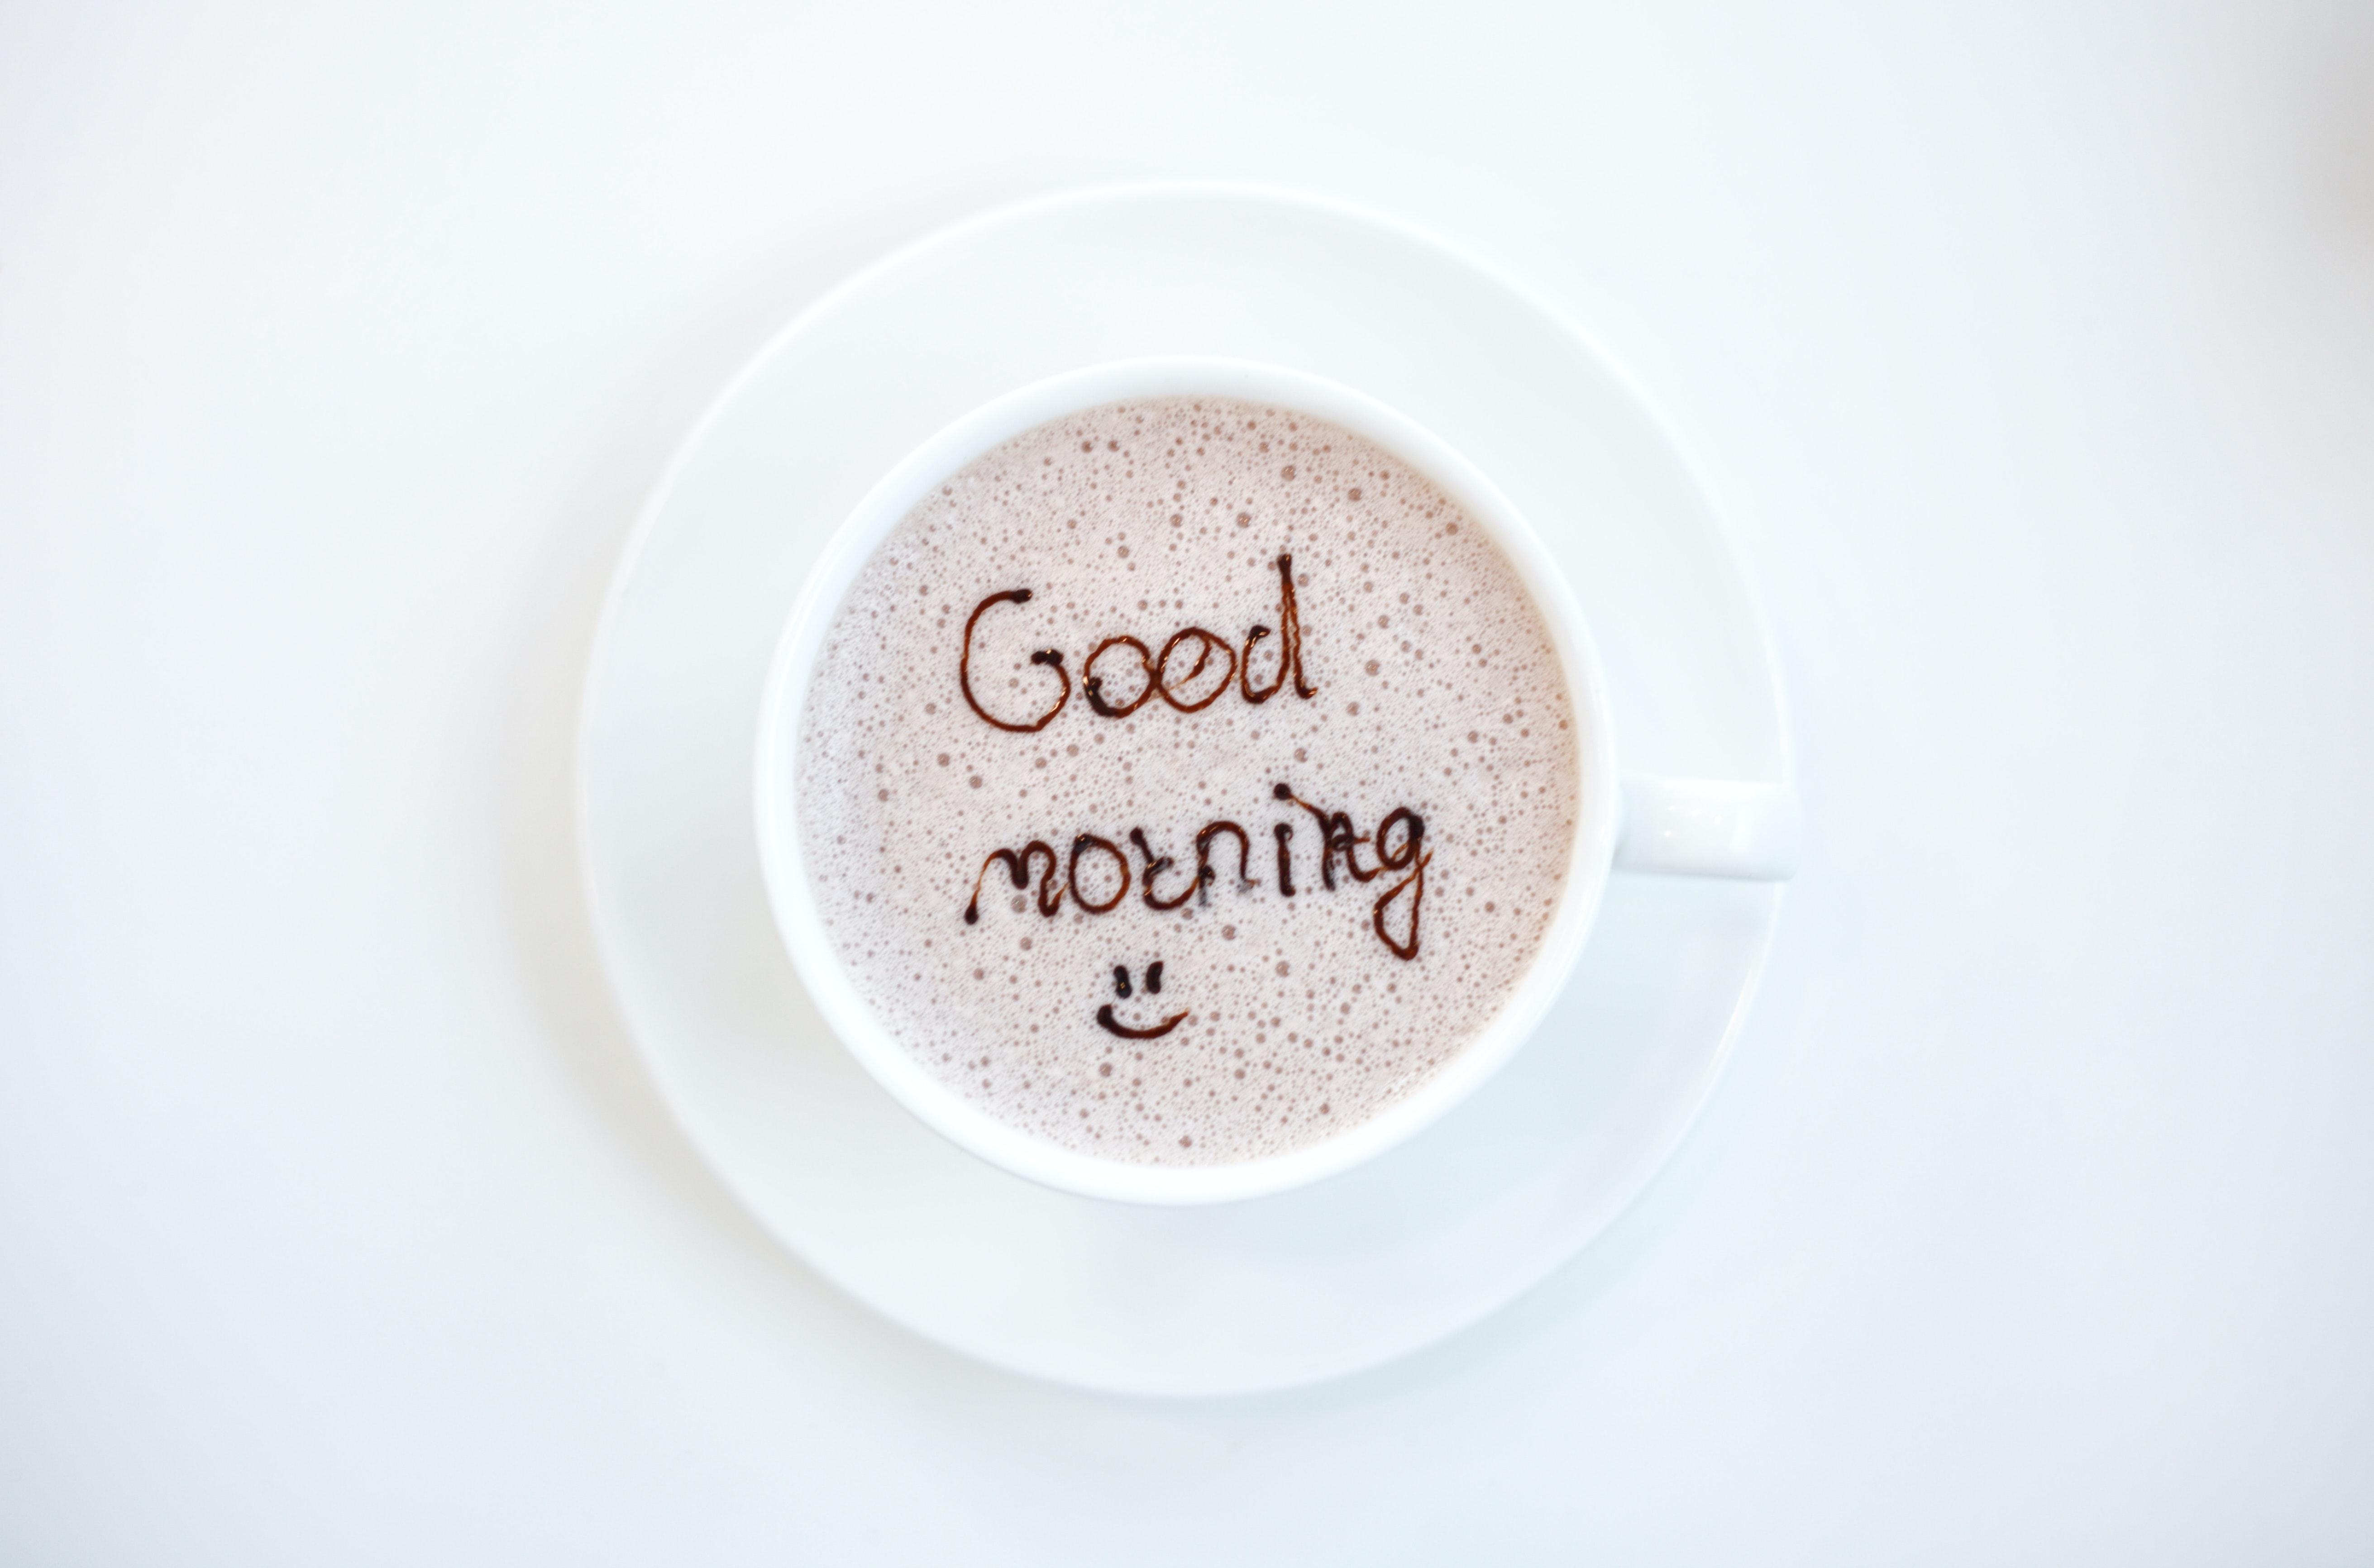 500 Beautiful Good Morning s · Pexels · Free Stock s